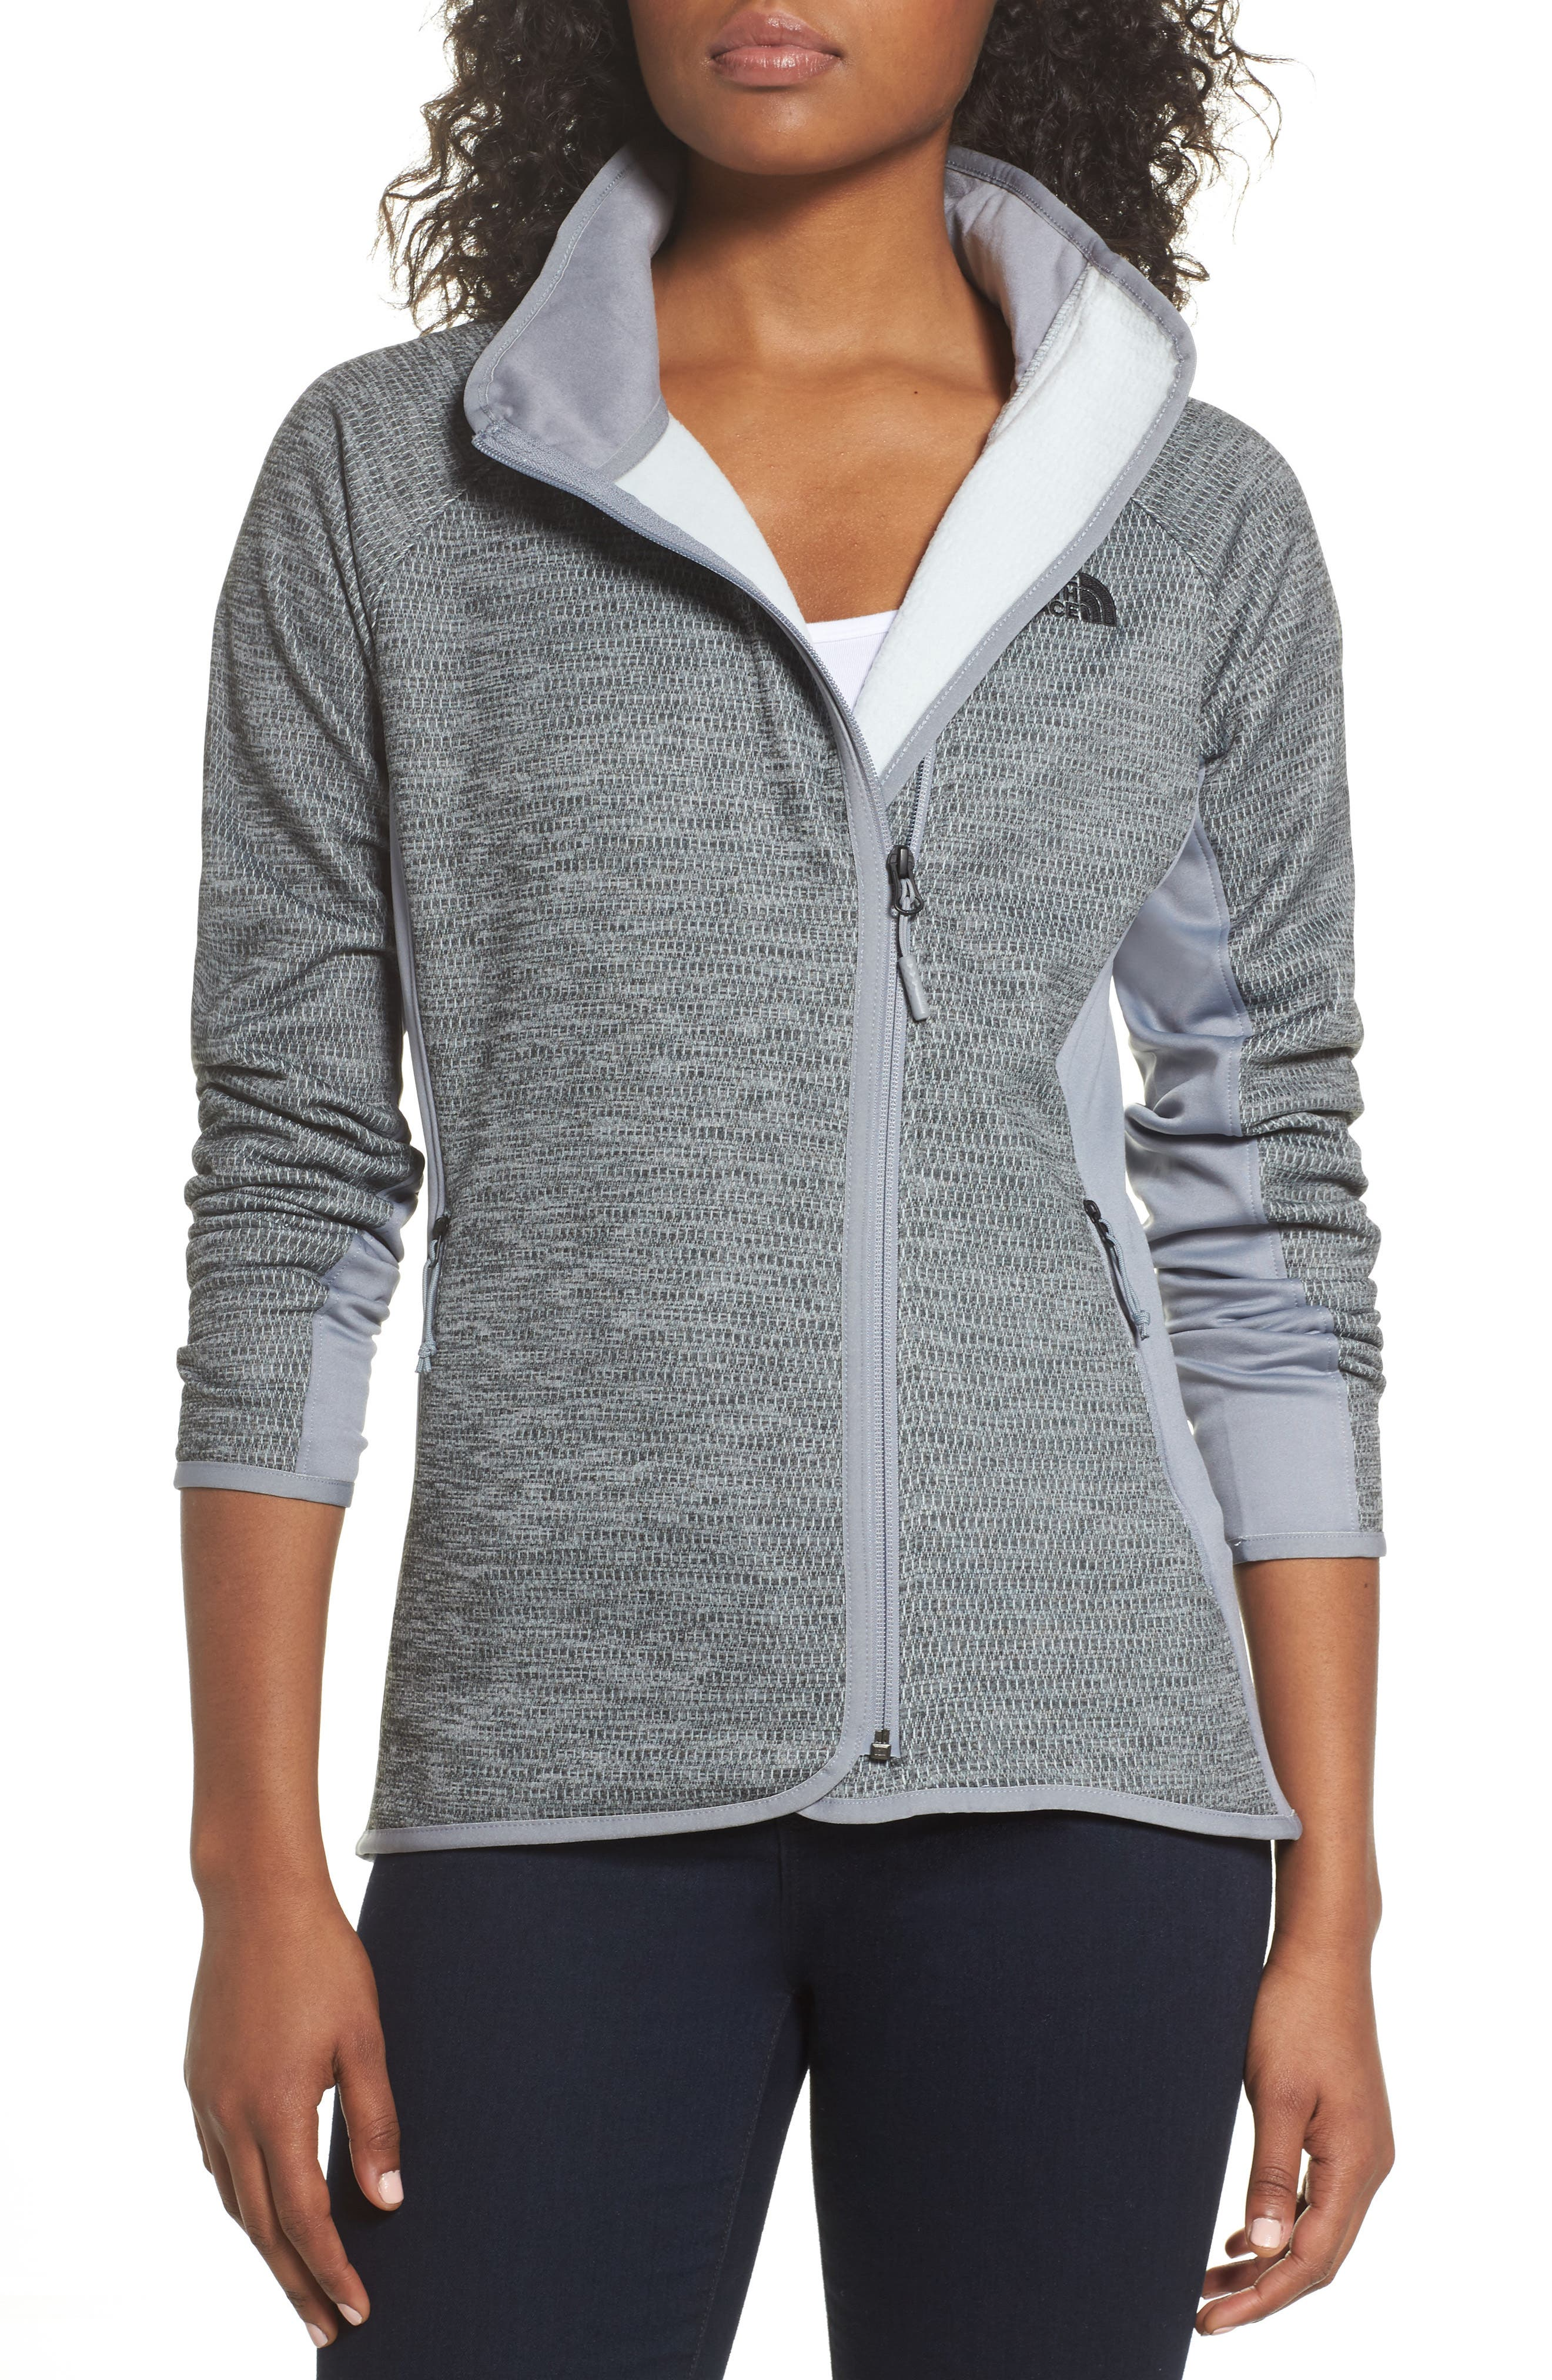 Arcata Zip Jacket,                         Main,                         color, Tnf Mid Grey Heather/ Black